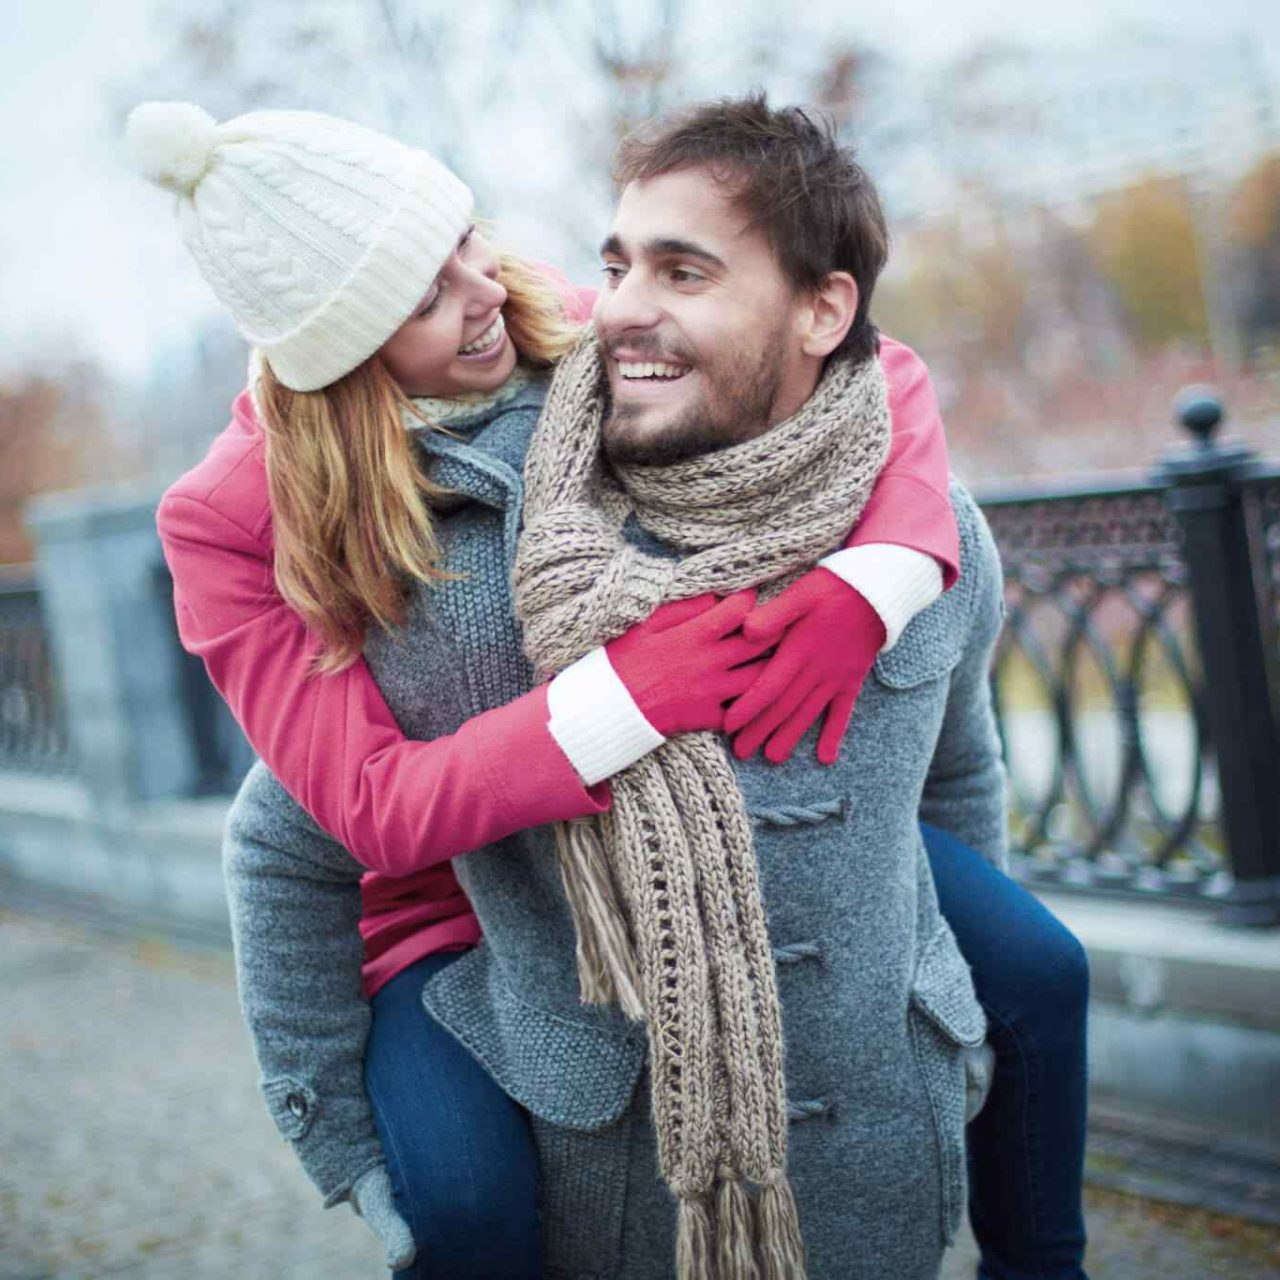 https://gotitasdepoliamor.com/wp-content/uploads/2018/01/img-event-marriage-01-1280x1280.jpg